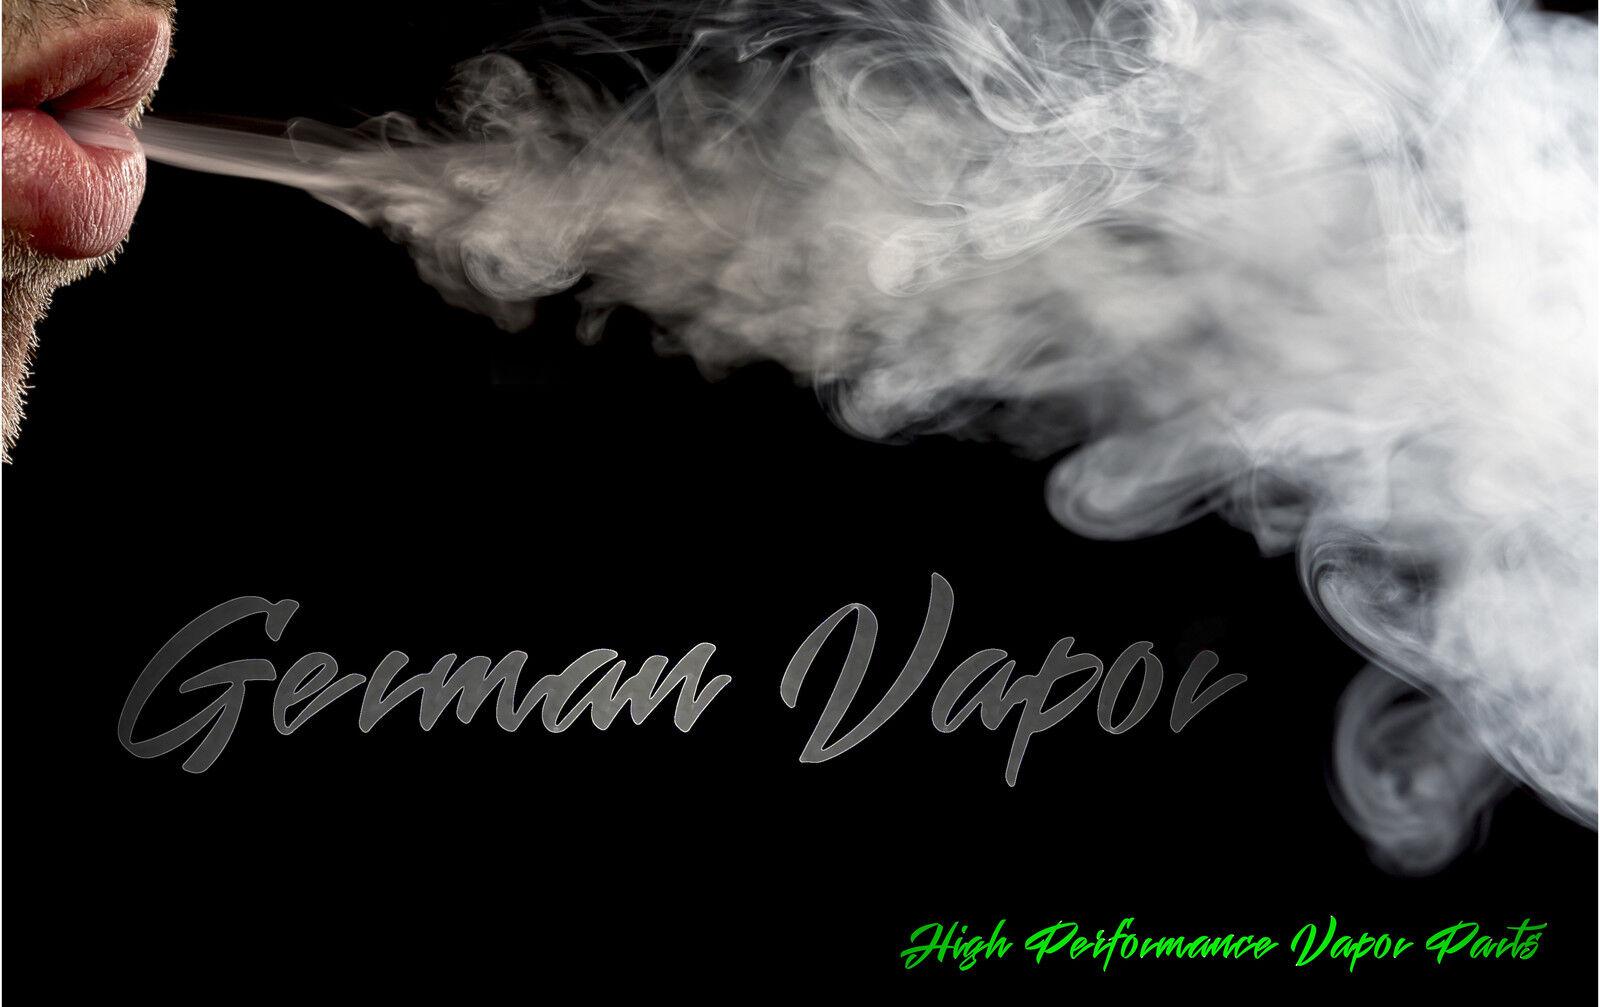 german-vapor